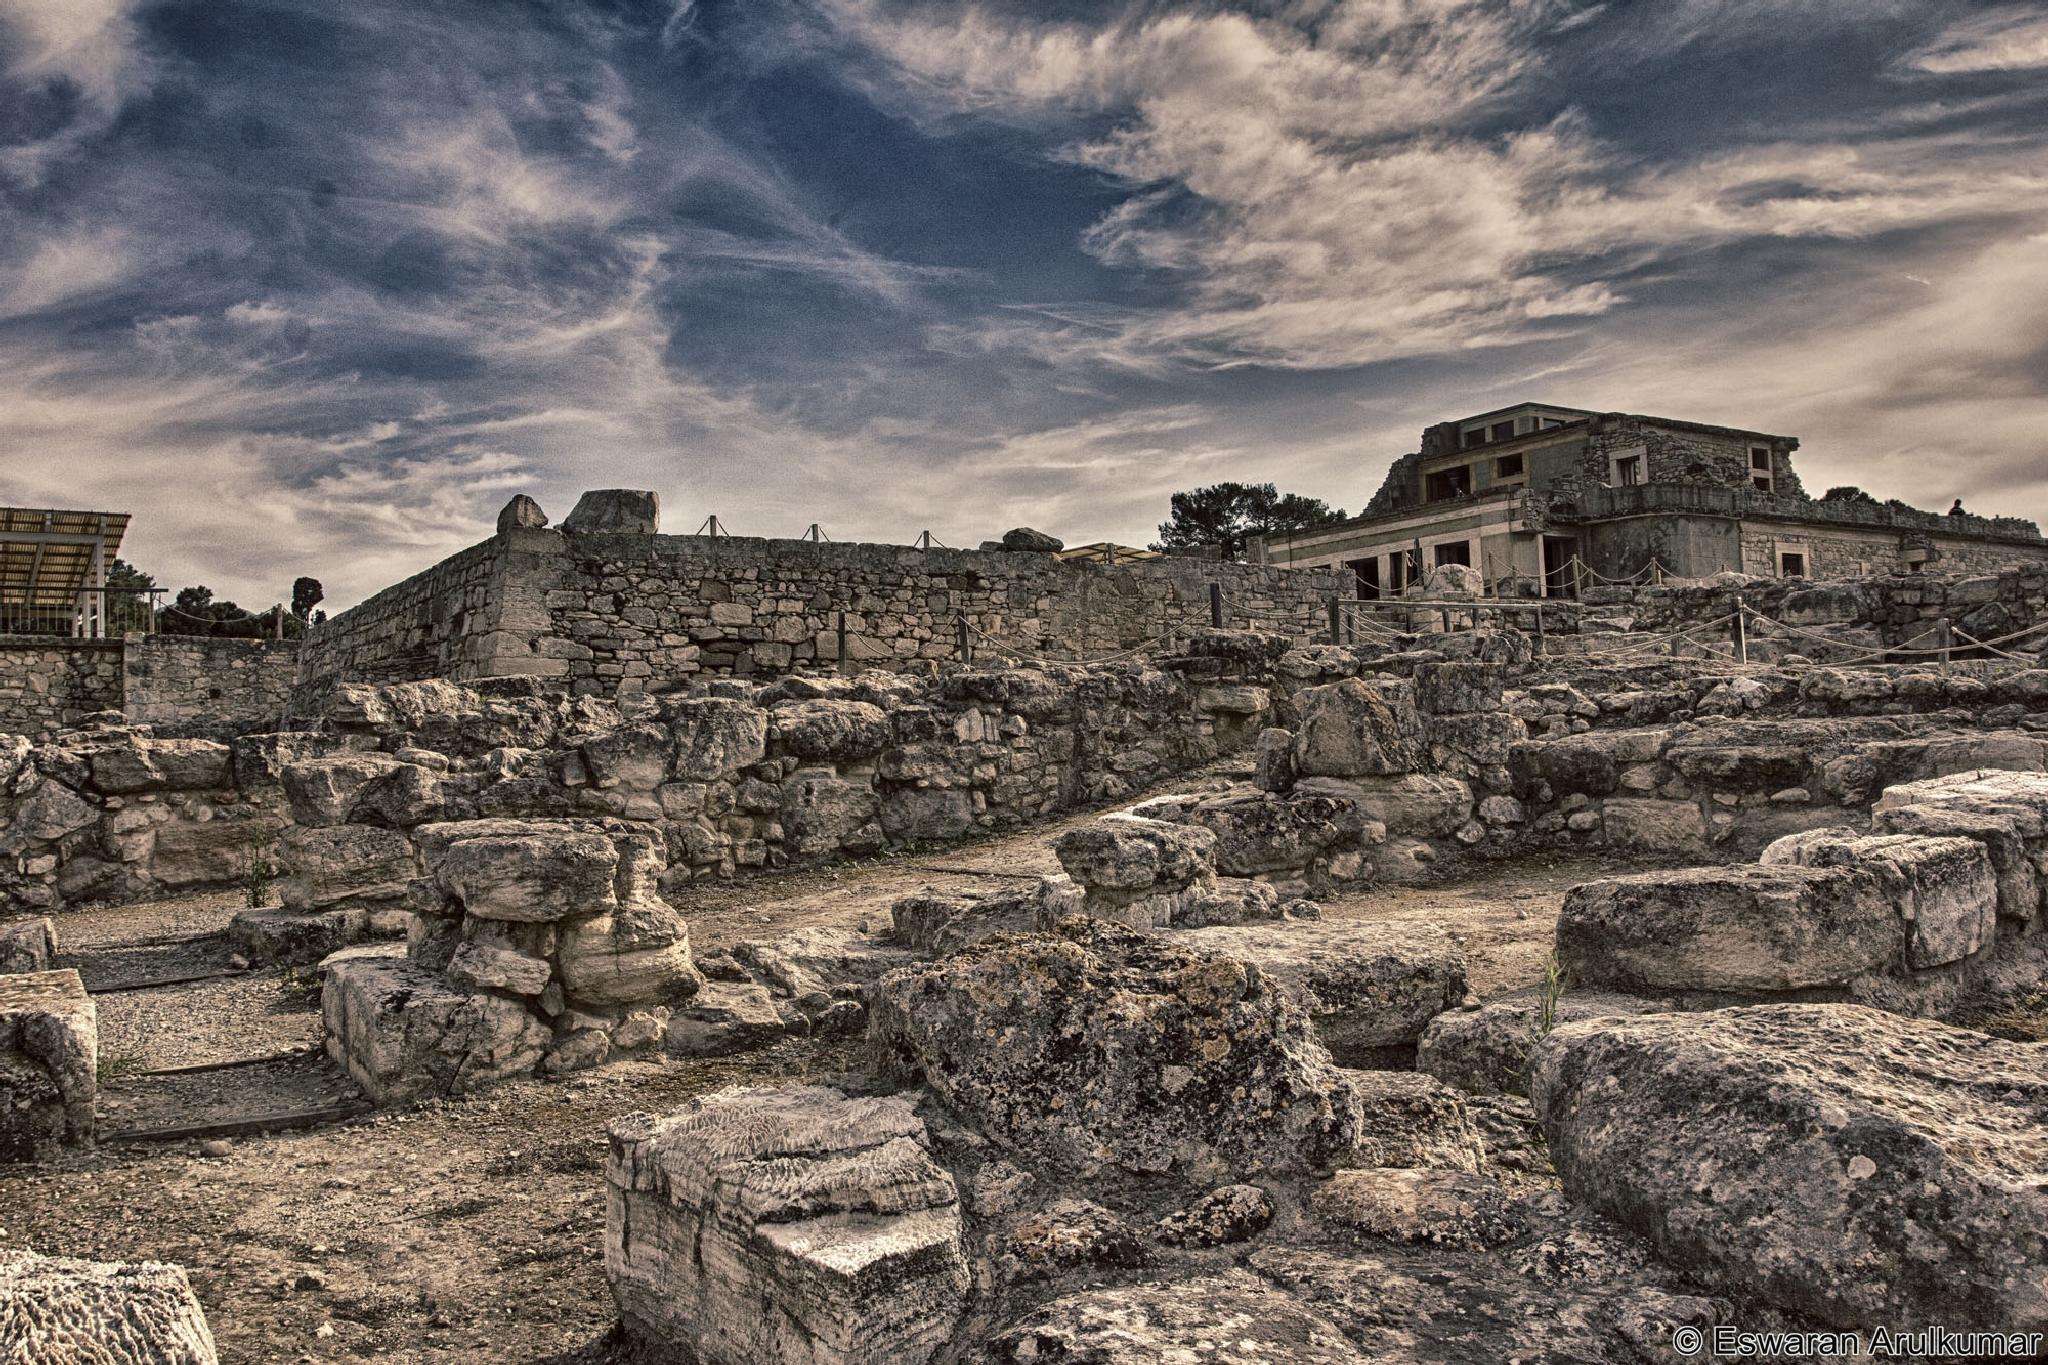 Ancient city of Crete, Knossos  by Eswaran Arulkumar